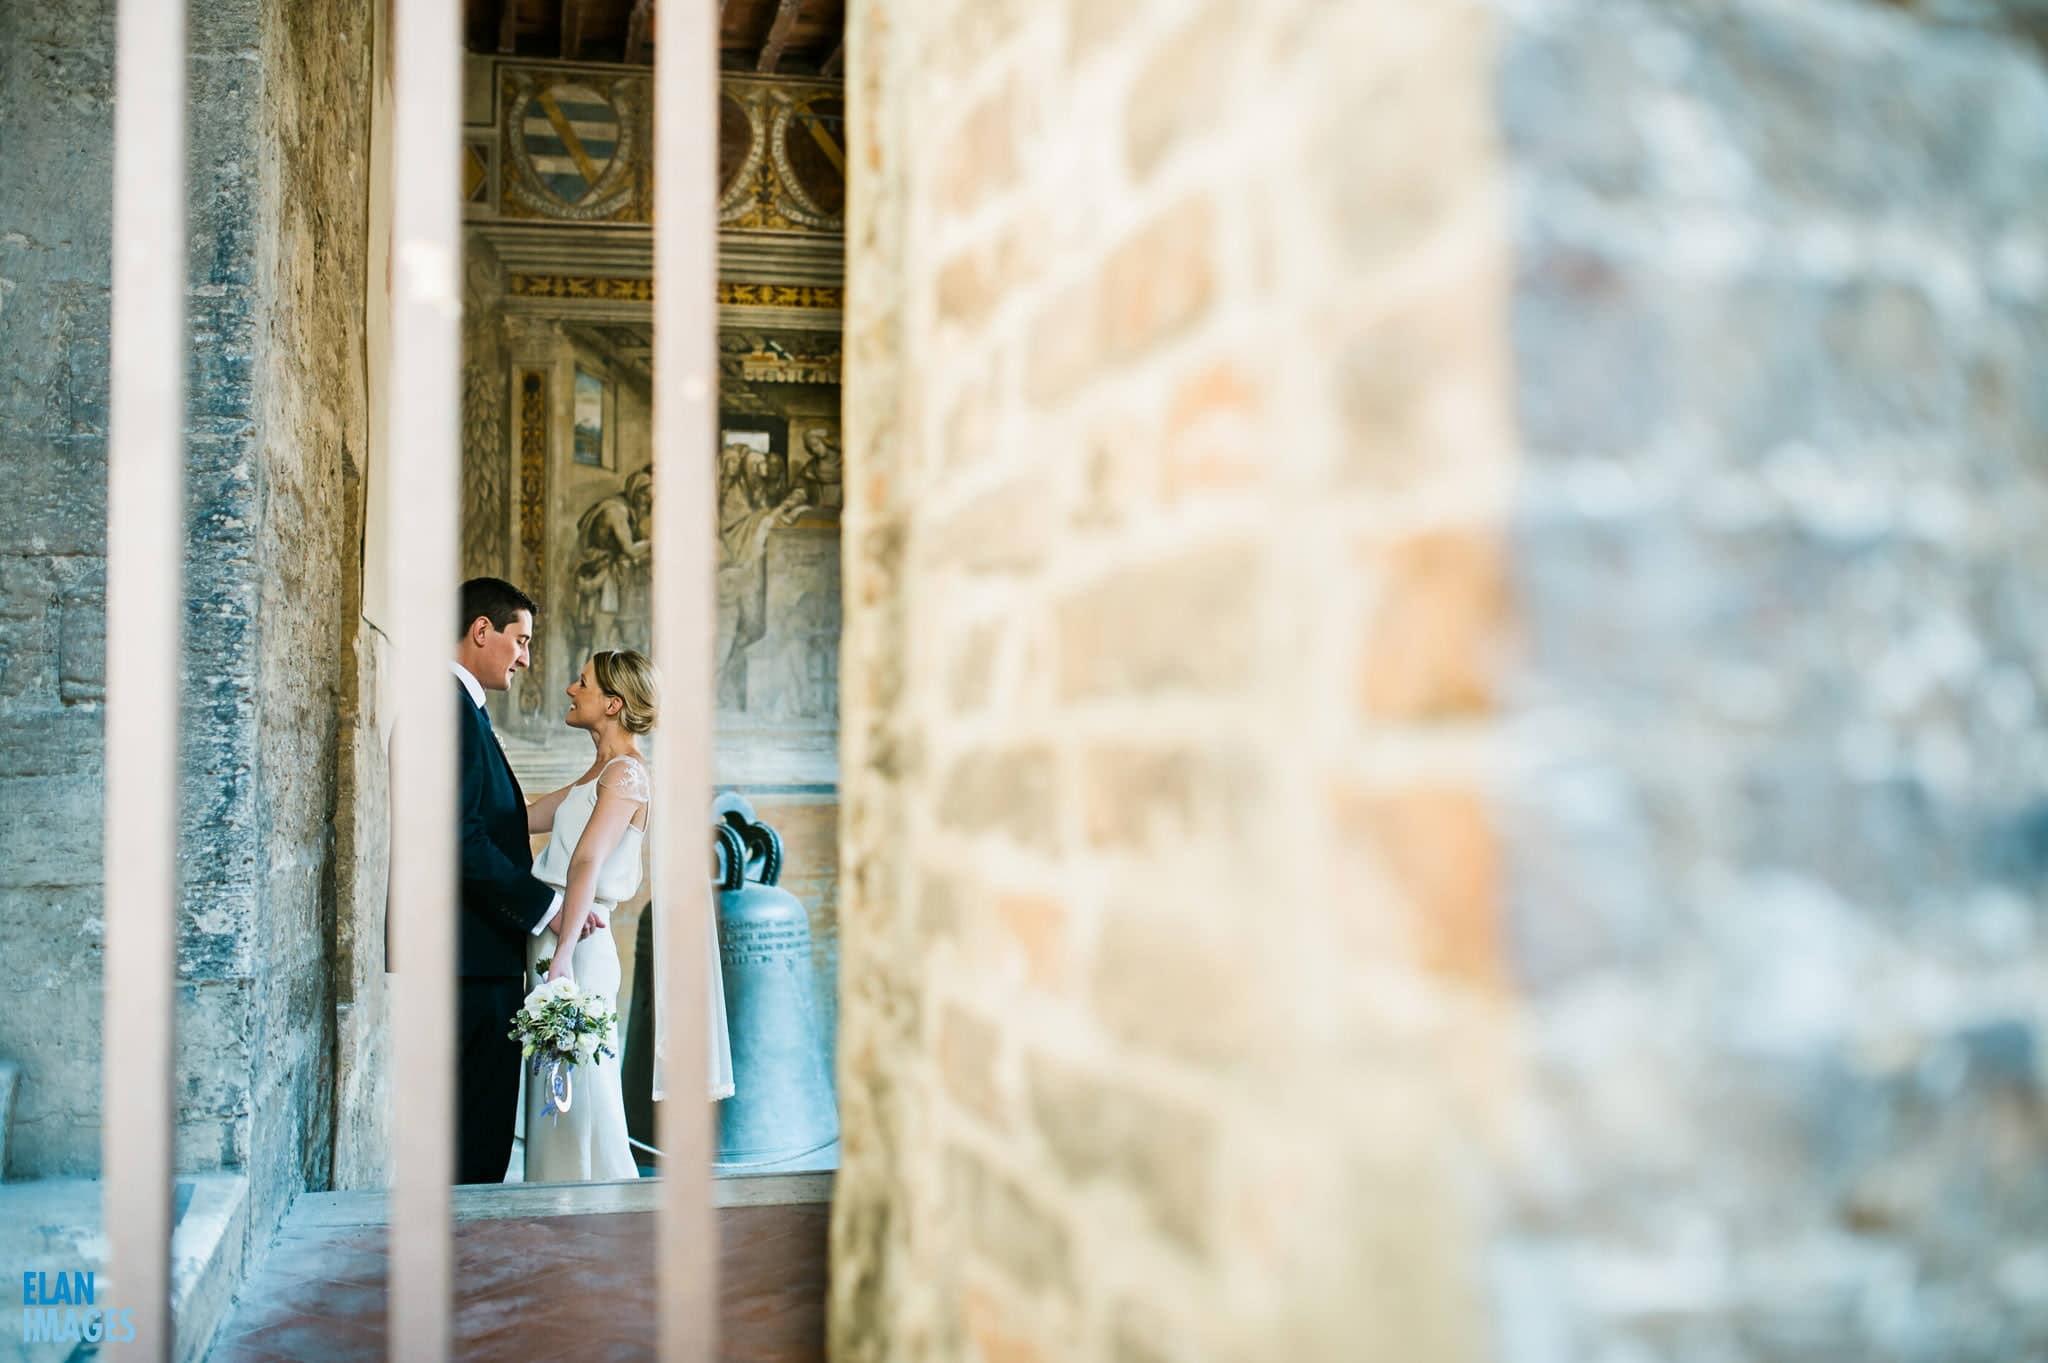 San Gimignano Wedding in Italy 43